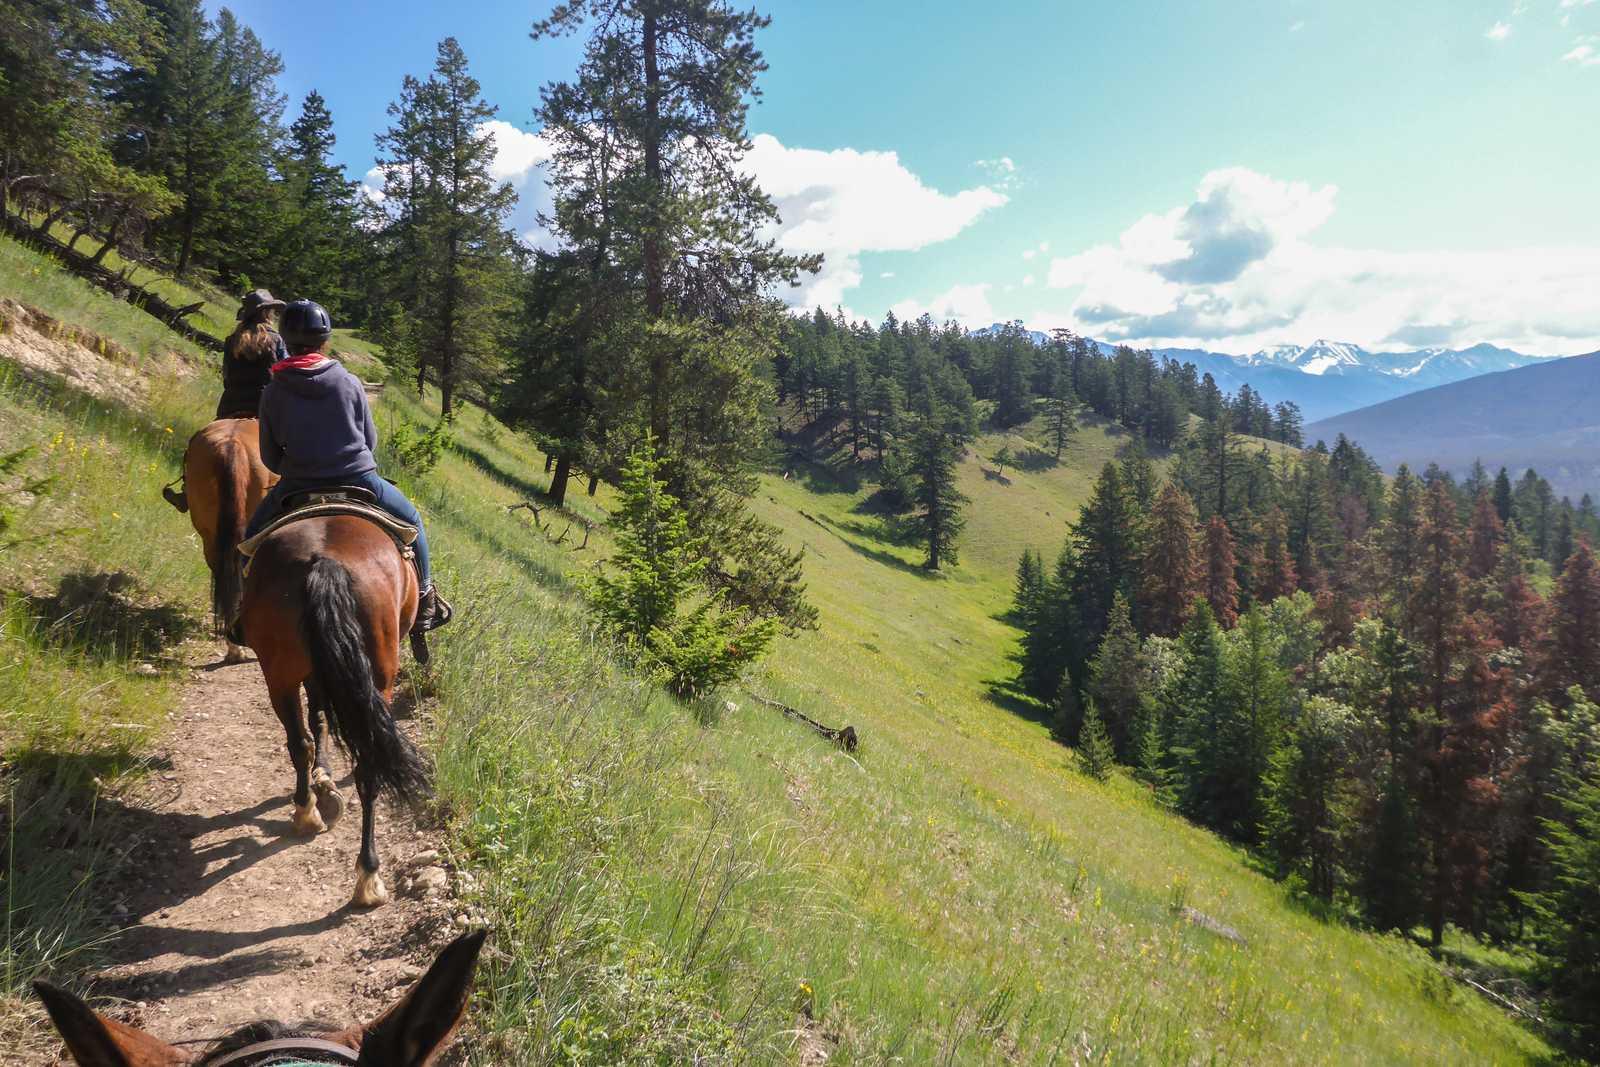 Maja Sebode macht einen Ausritt mit Jasper Park Riding Stables im Jasper National Park